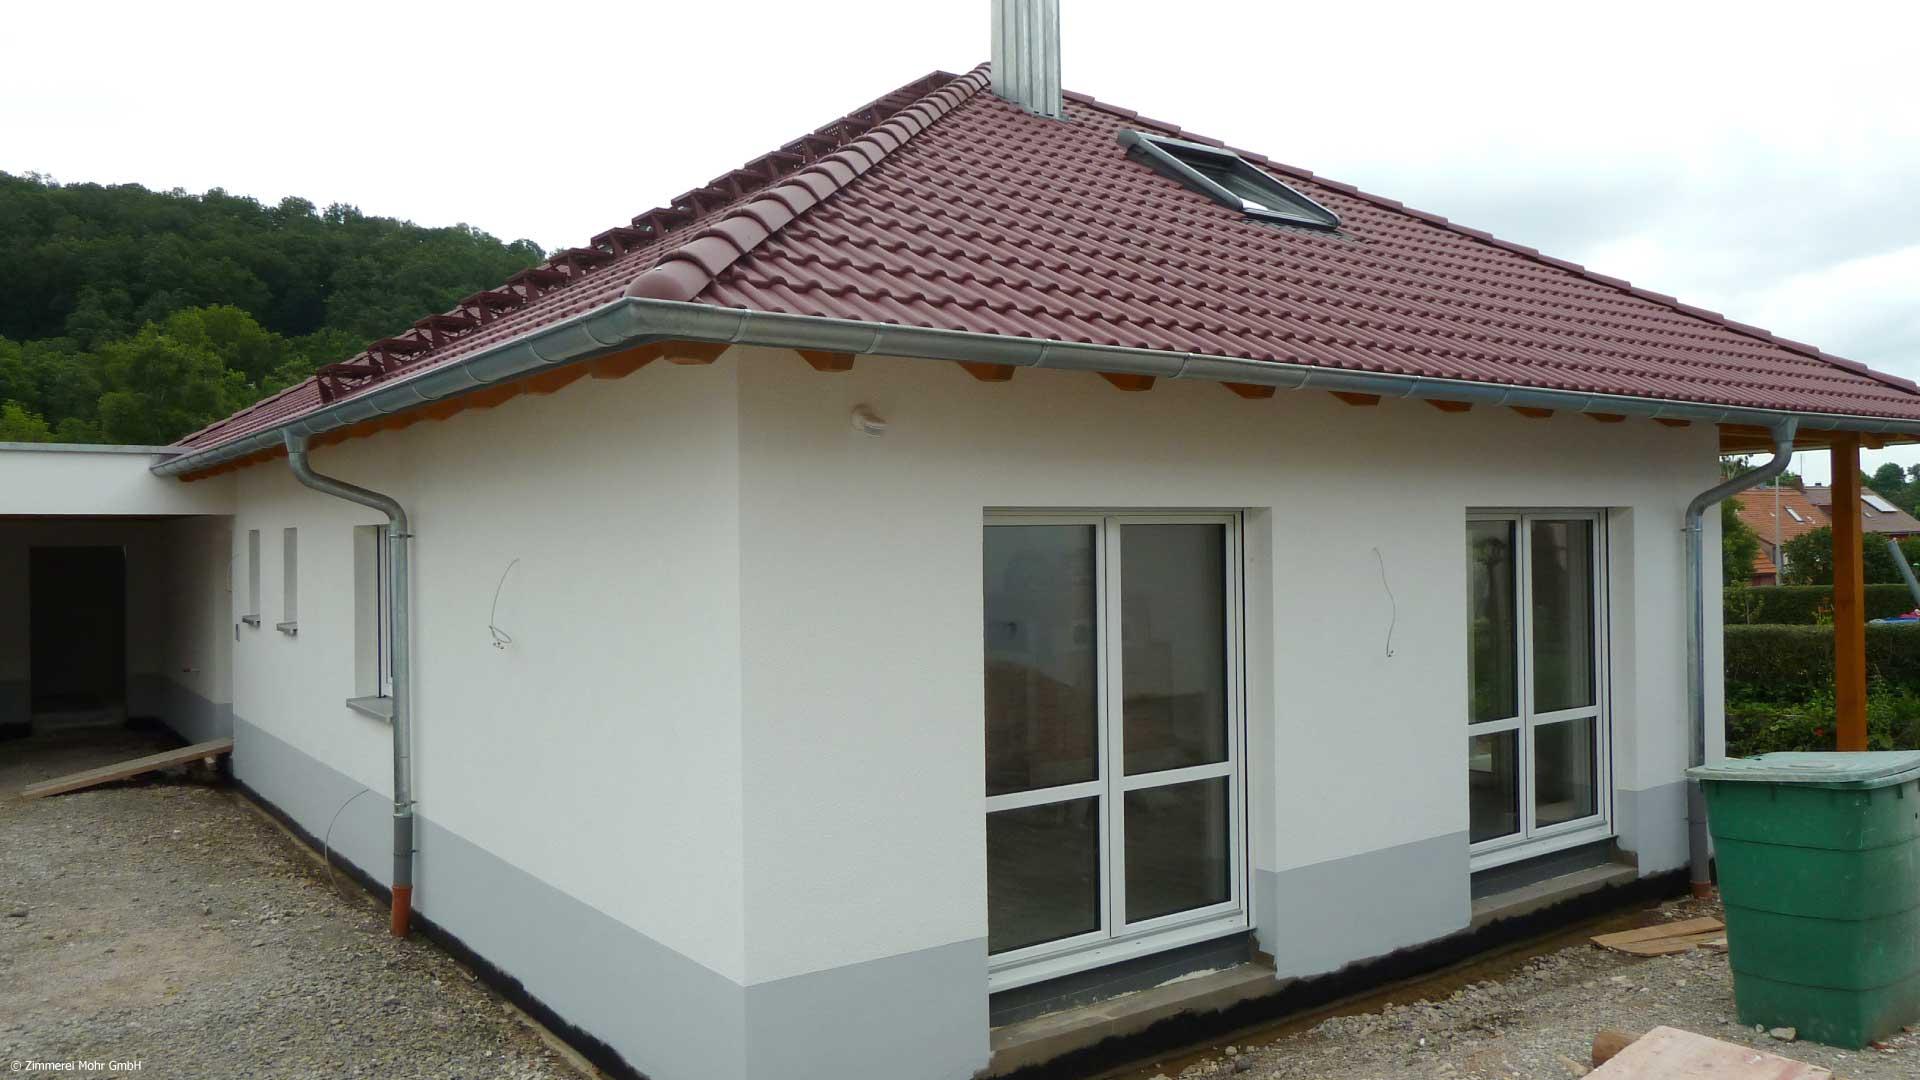 Bungalow SQUARE - Holzhaus Neubau mit Carport